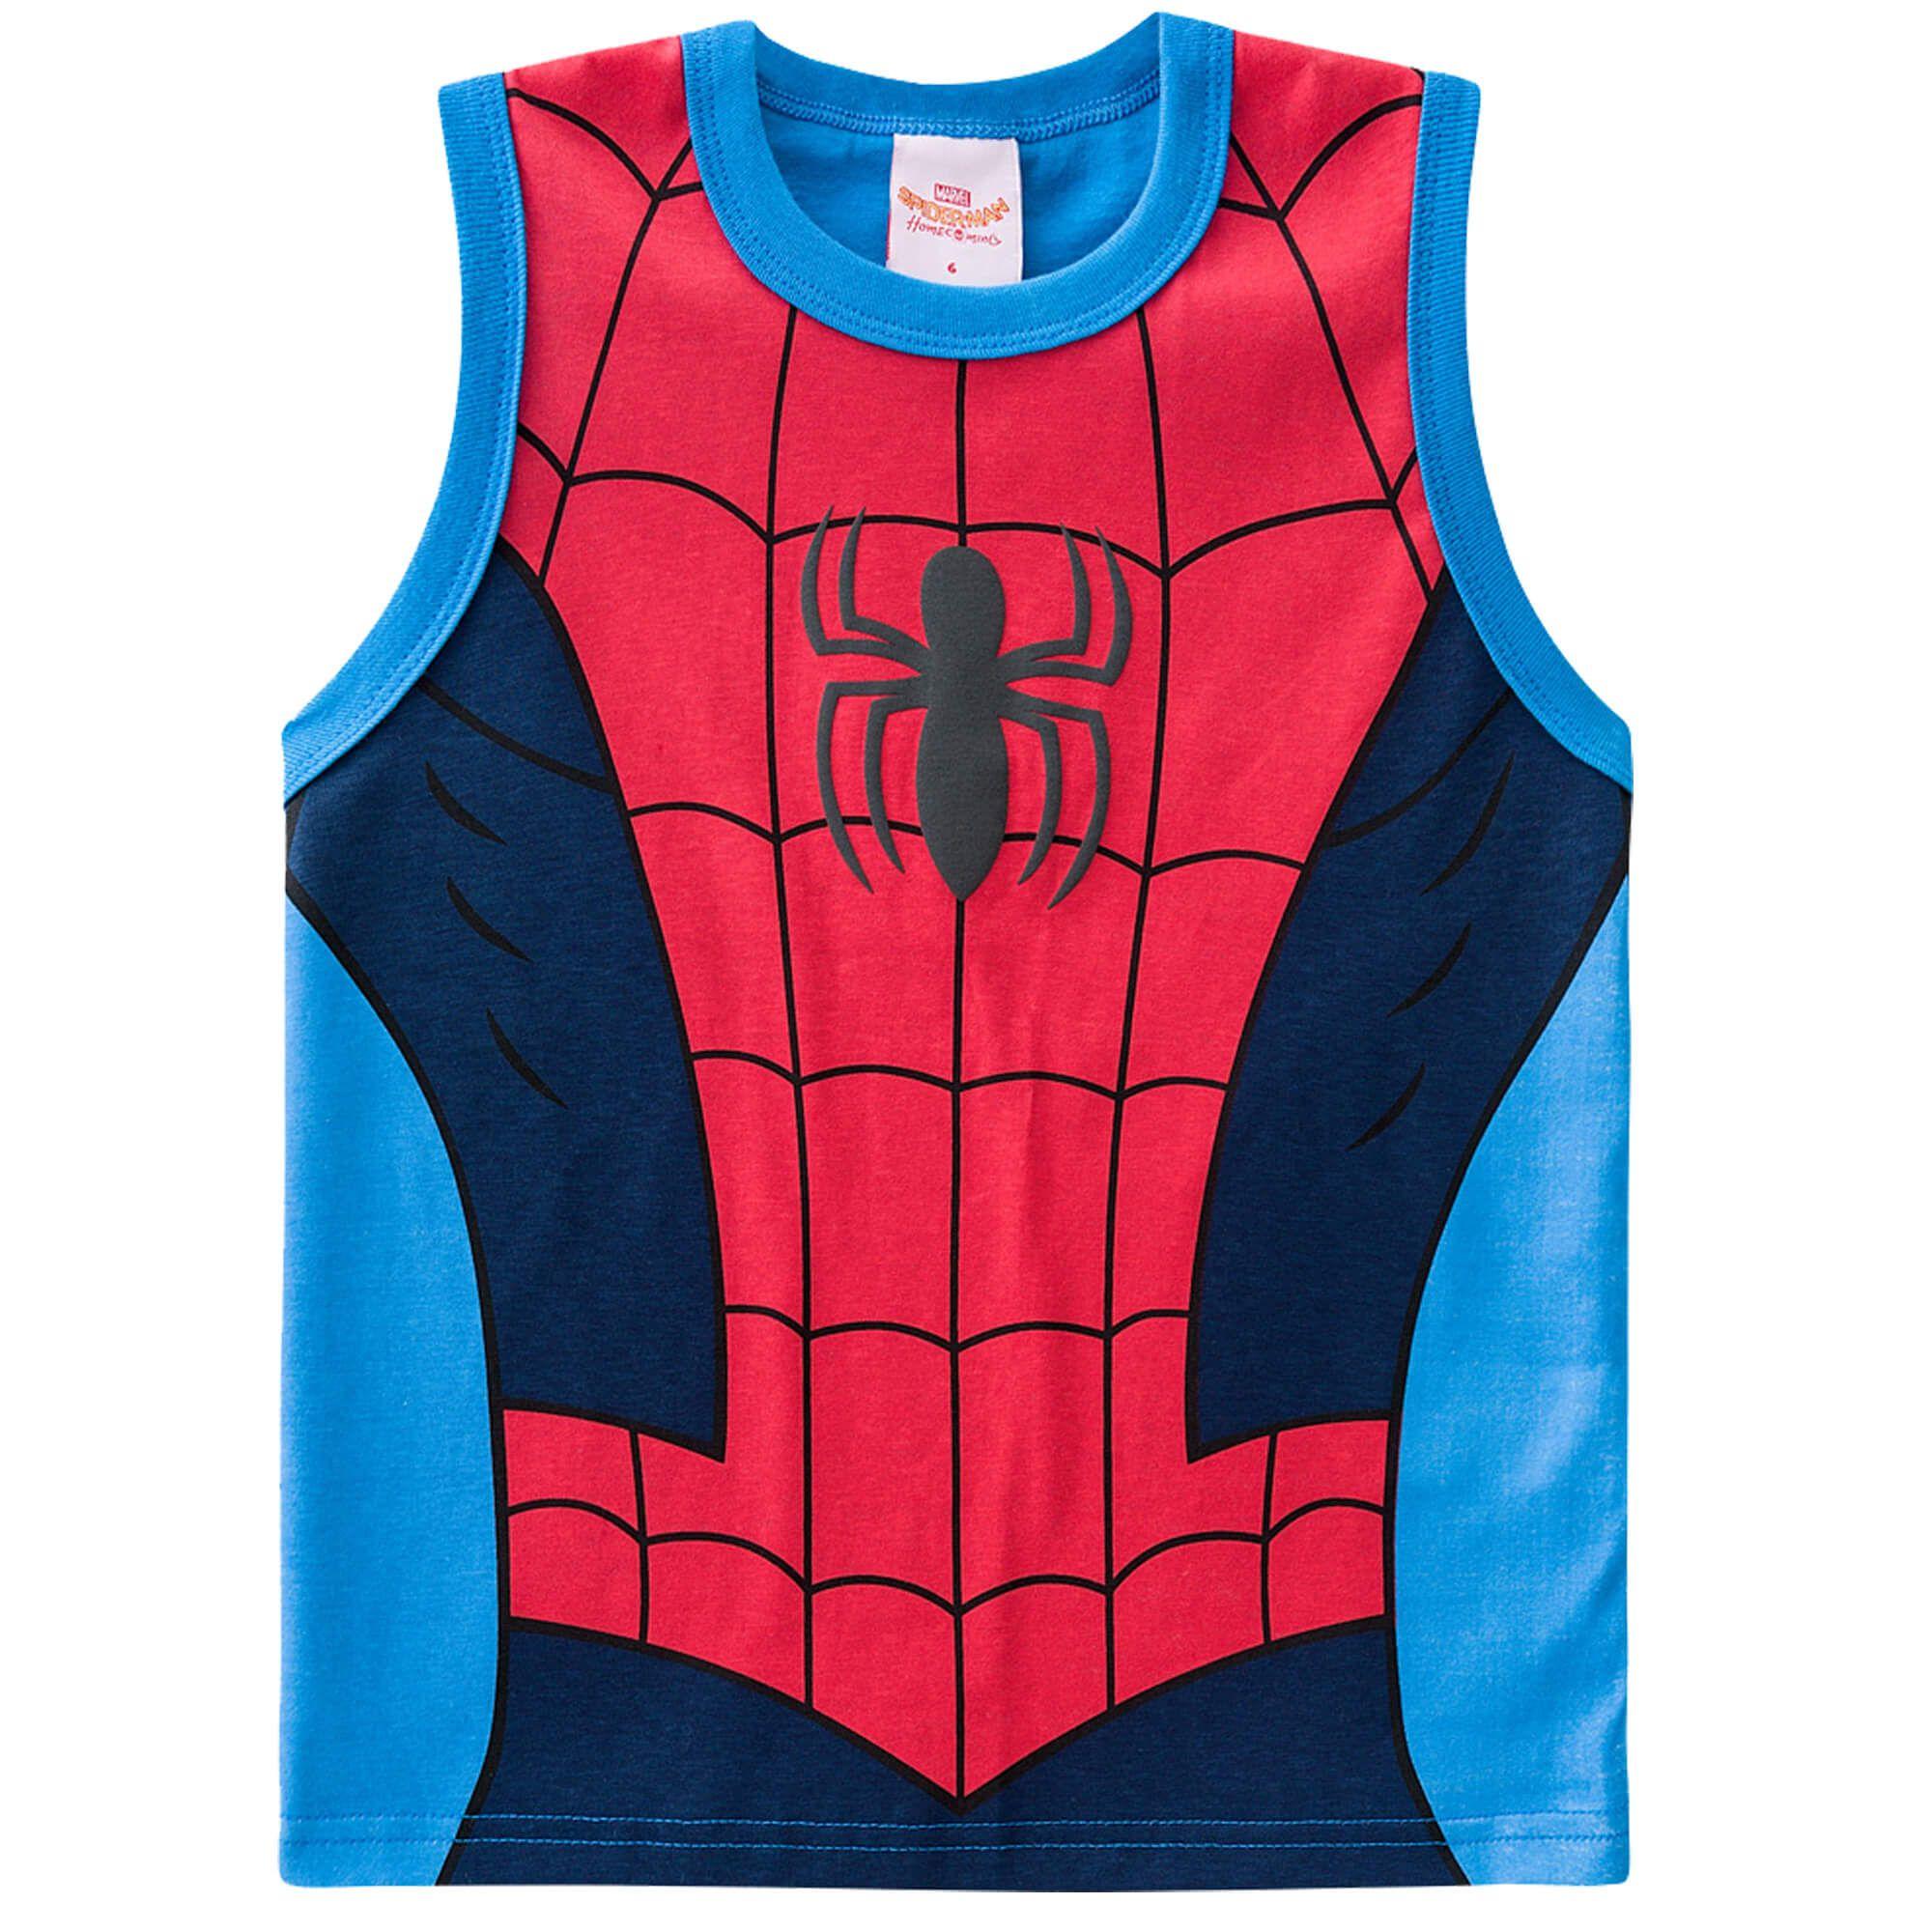 Regata Brandili Homem Aranha - 01 ao 03